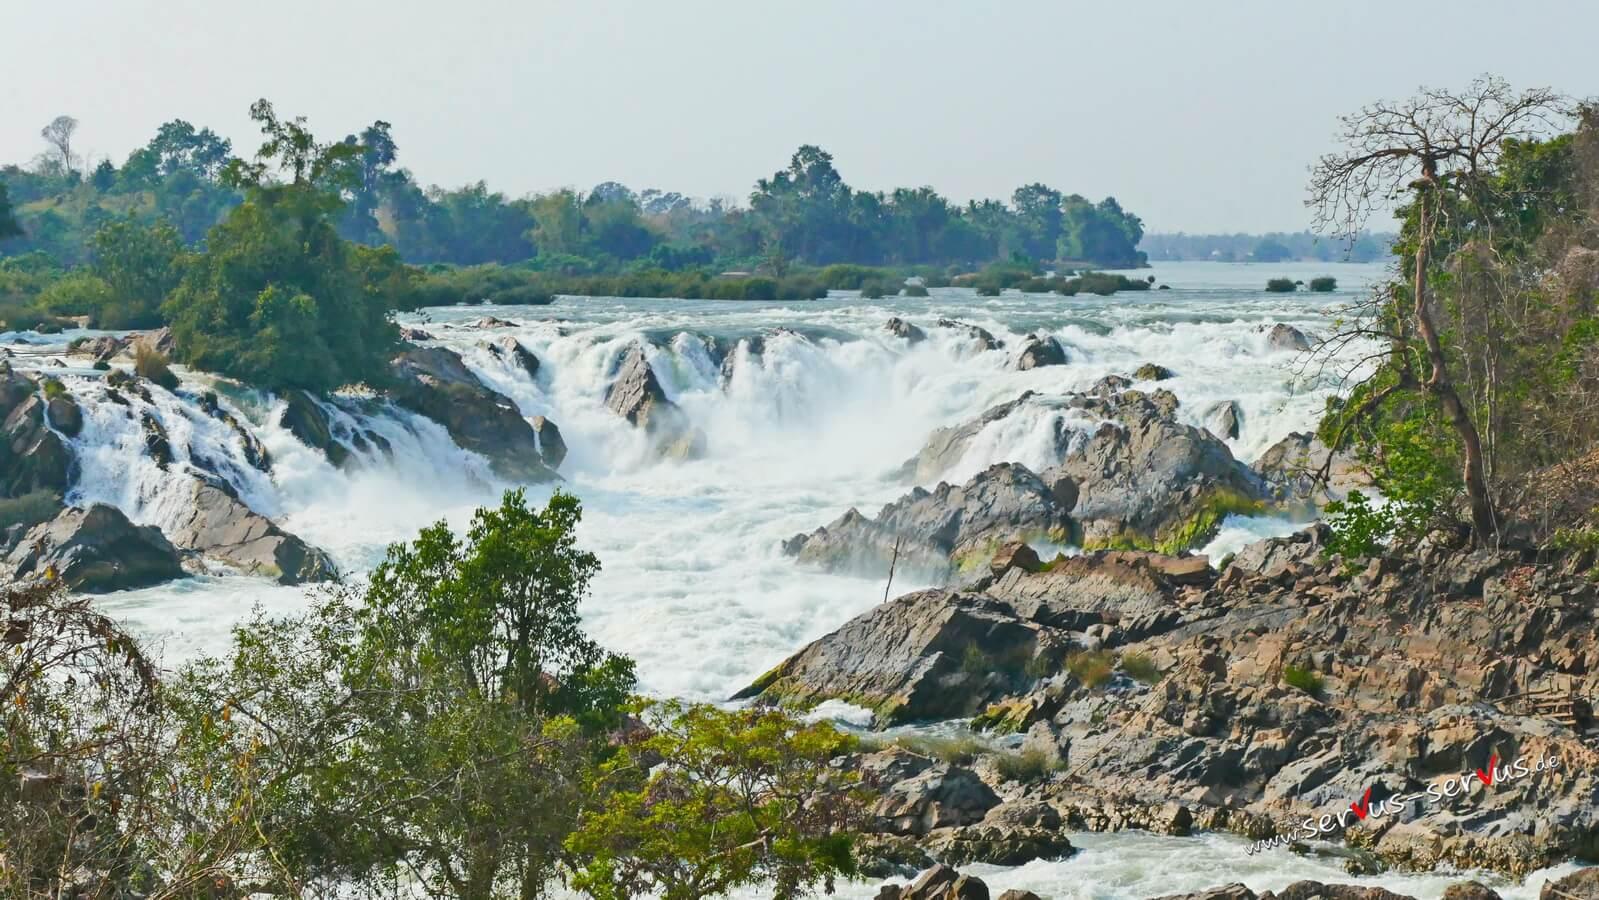 Khone Phapheng Wasserfall, Laos, Don Khone, 4000 Inseln, Mekong